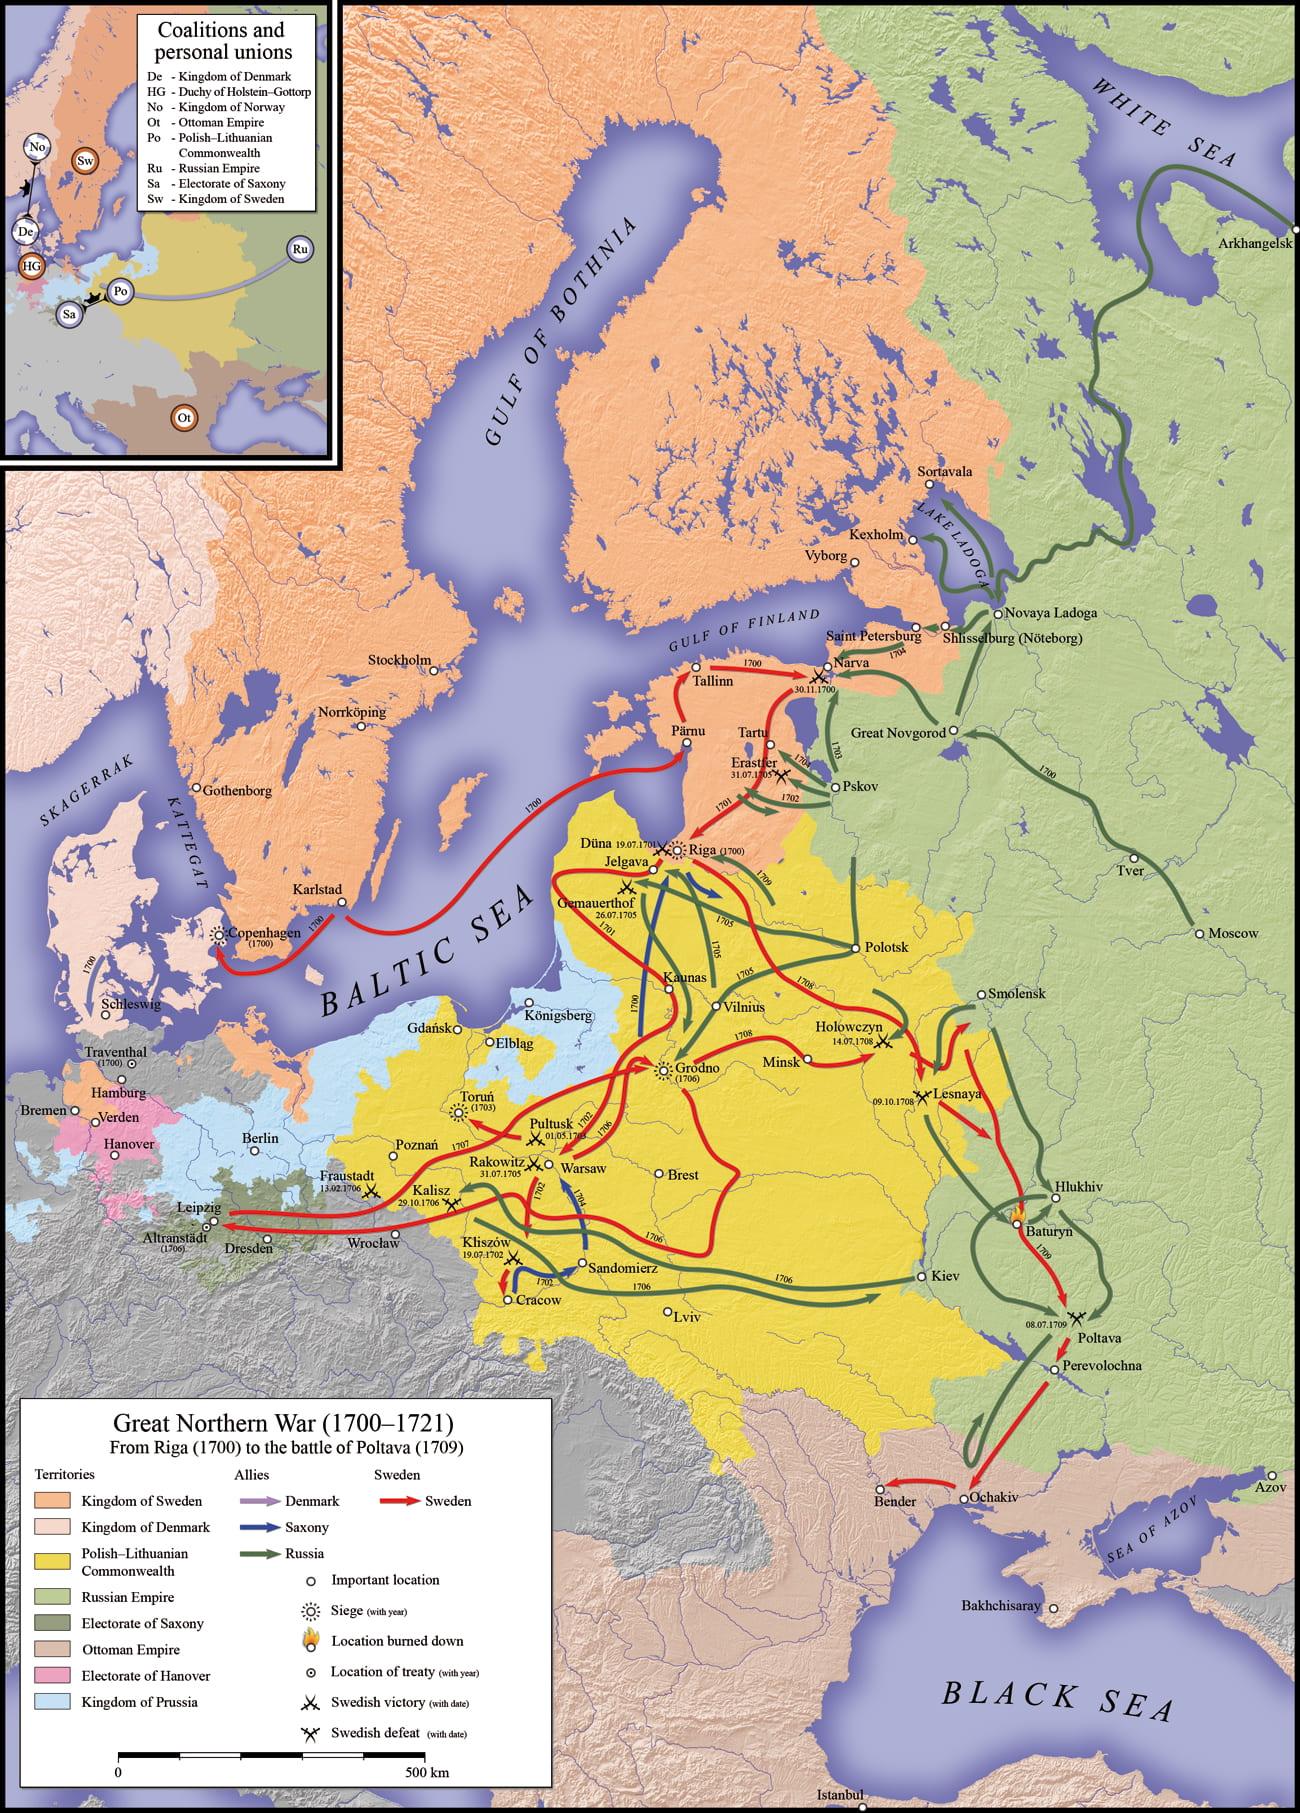 Ход войны в 1700—1709 годах / © S. Bollmann / ru.wikipedia.org